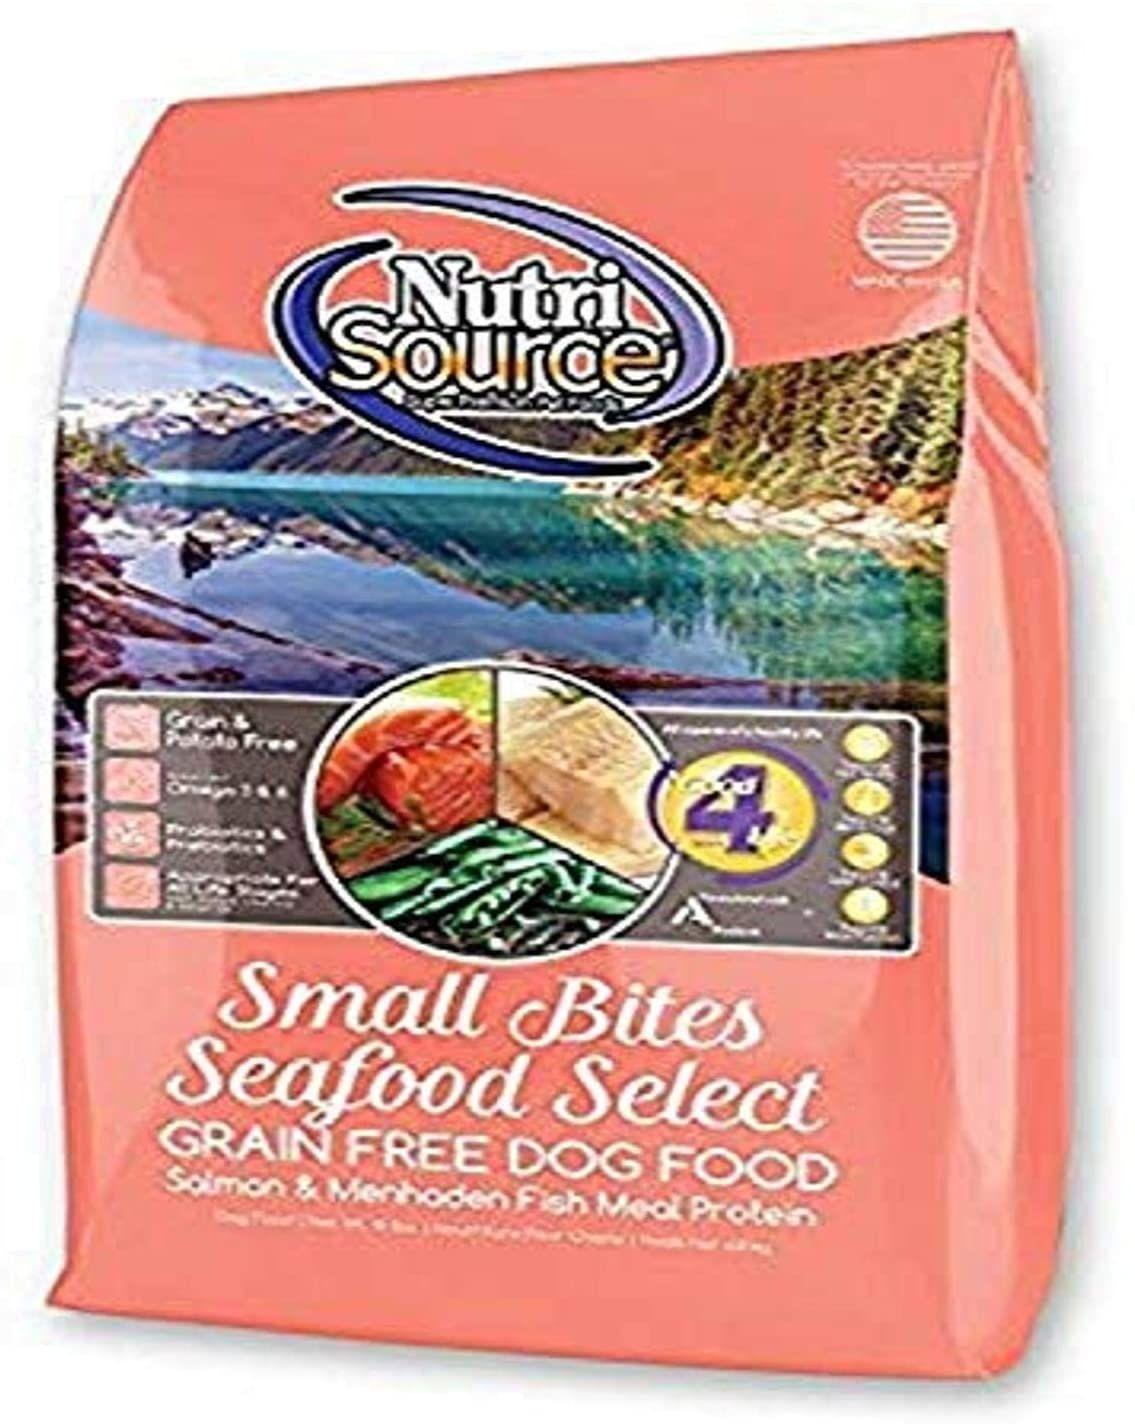 Nutri source small breed seafood select gf dog foodlb pet